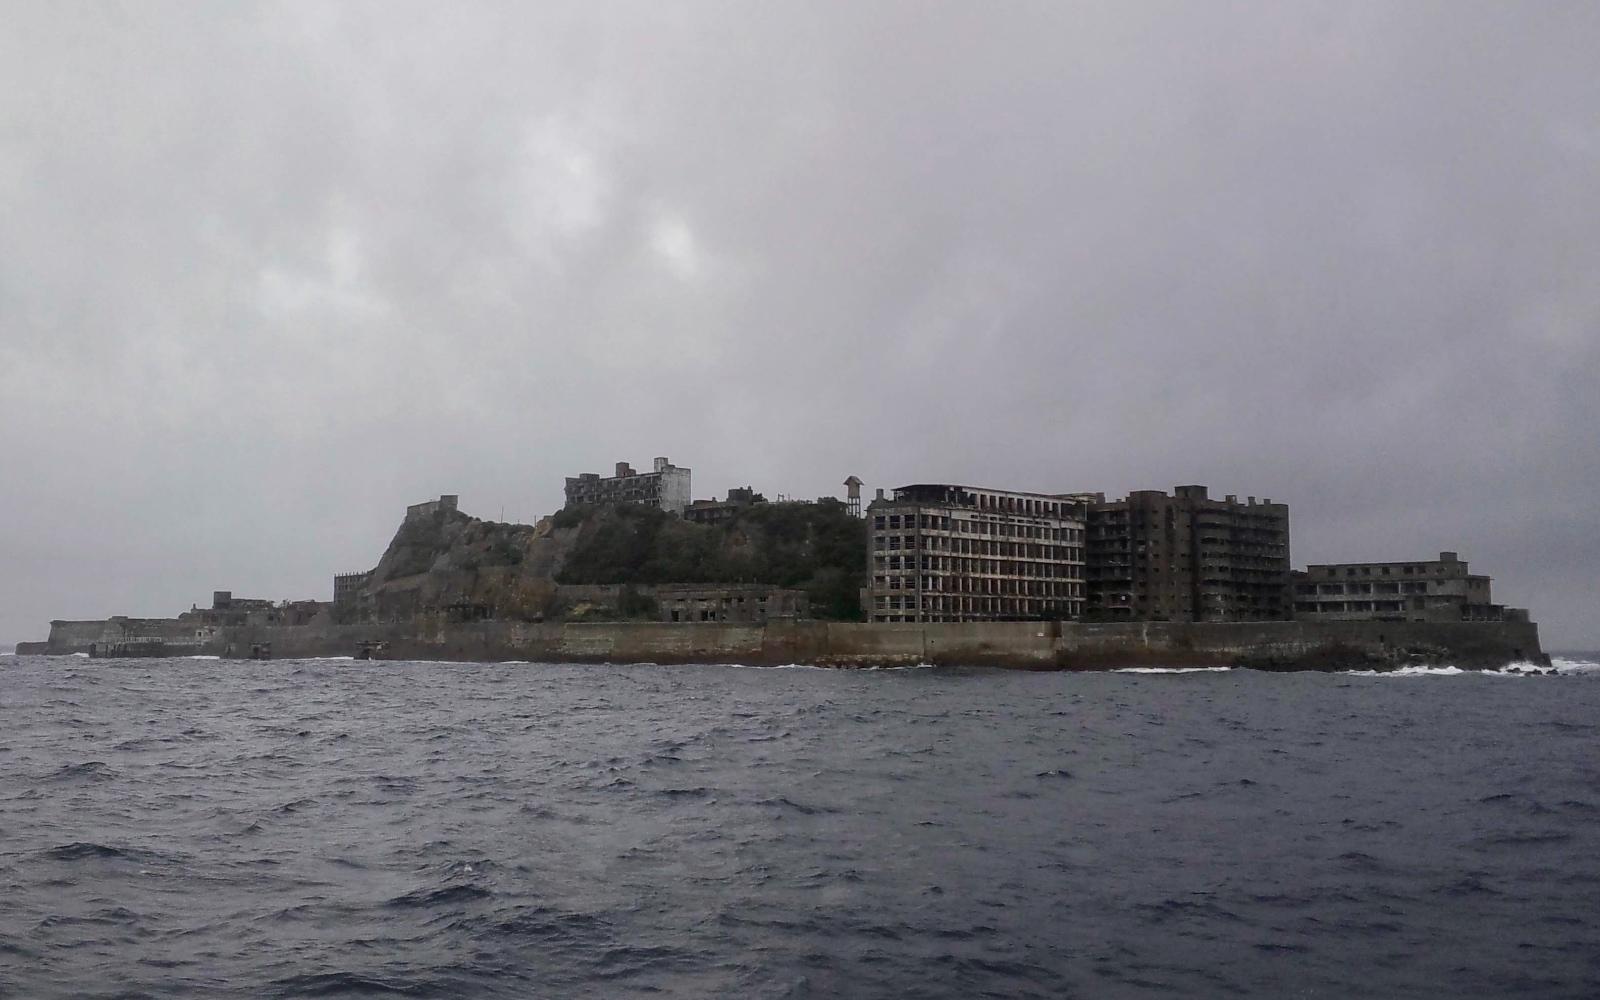 Hashima, otherwise known as Gunkanjima, or Battleship Island.